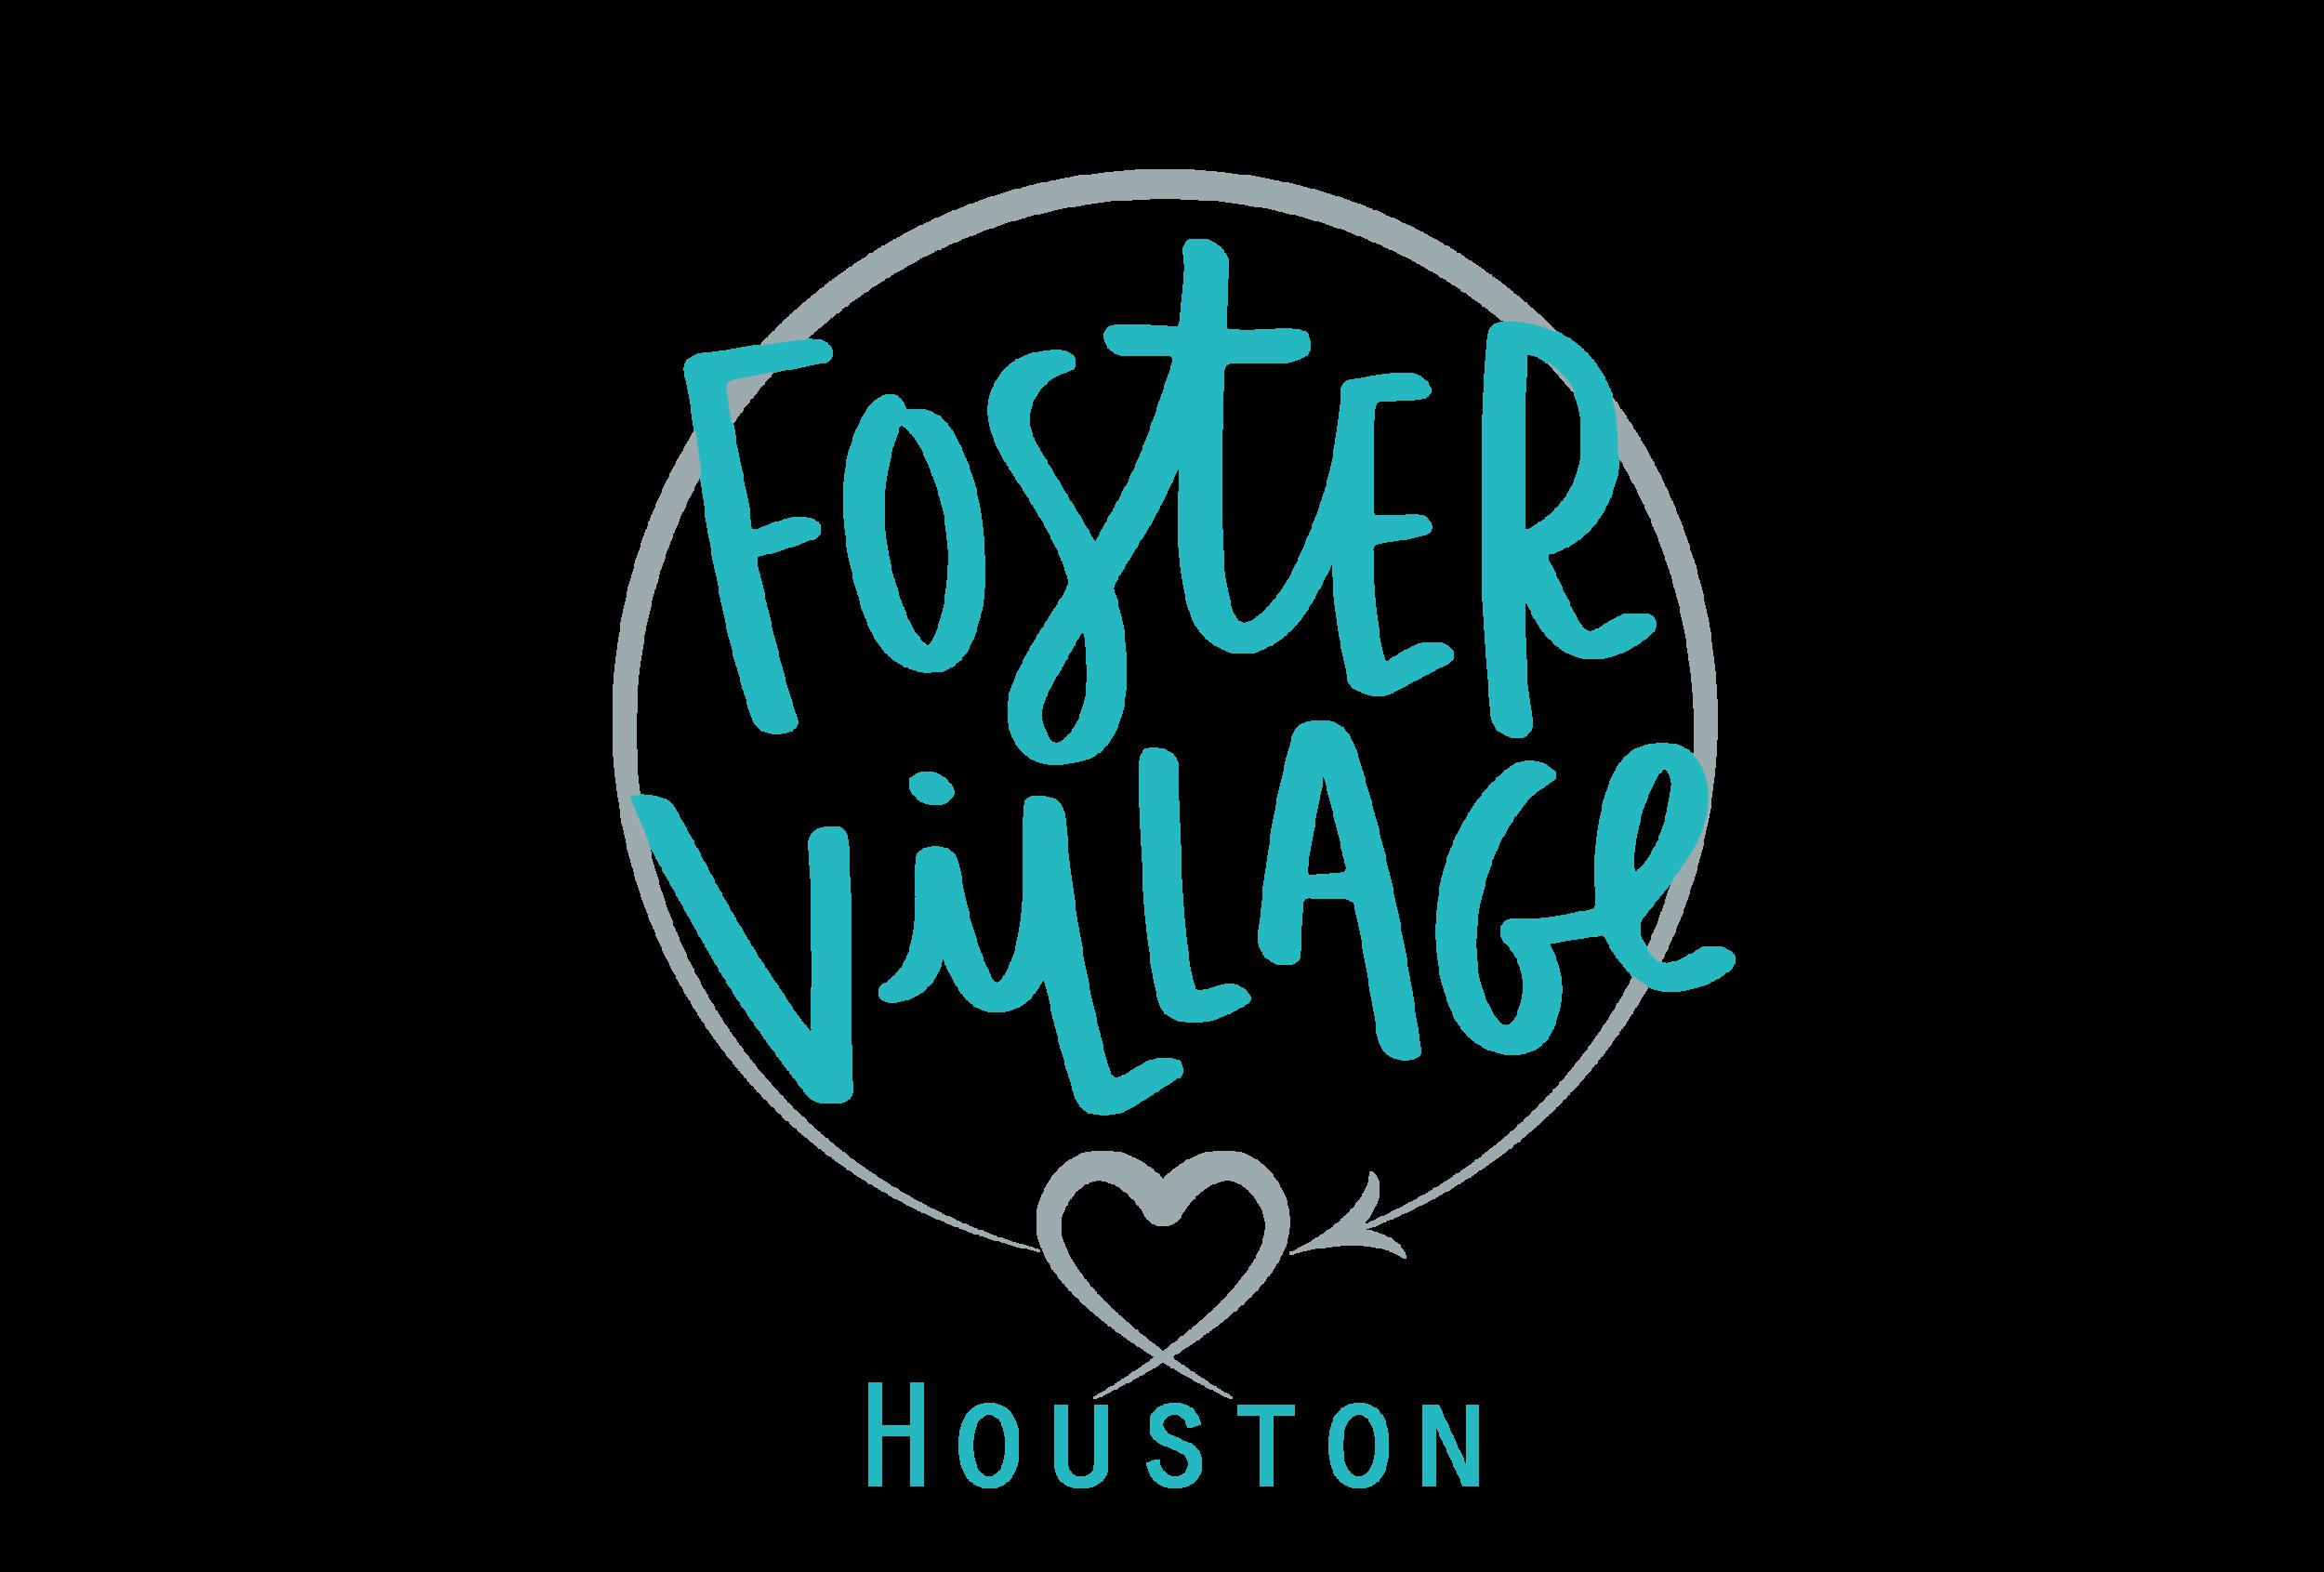 FV_Houston_logo.png